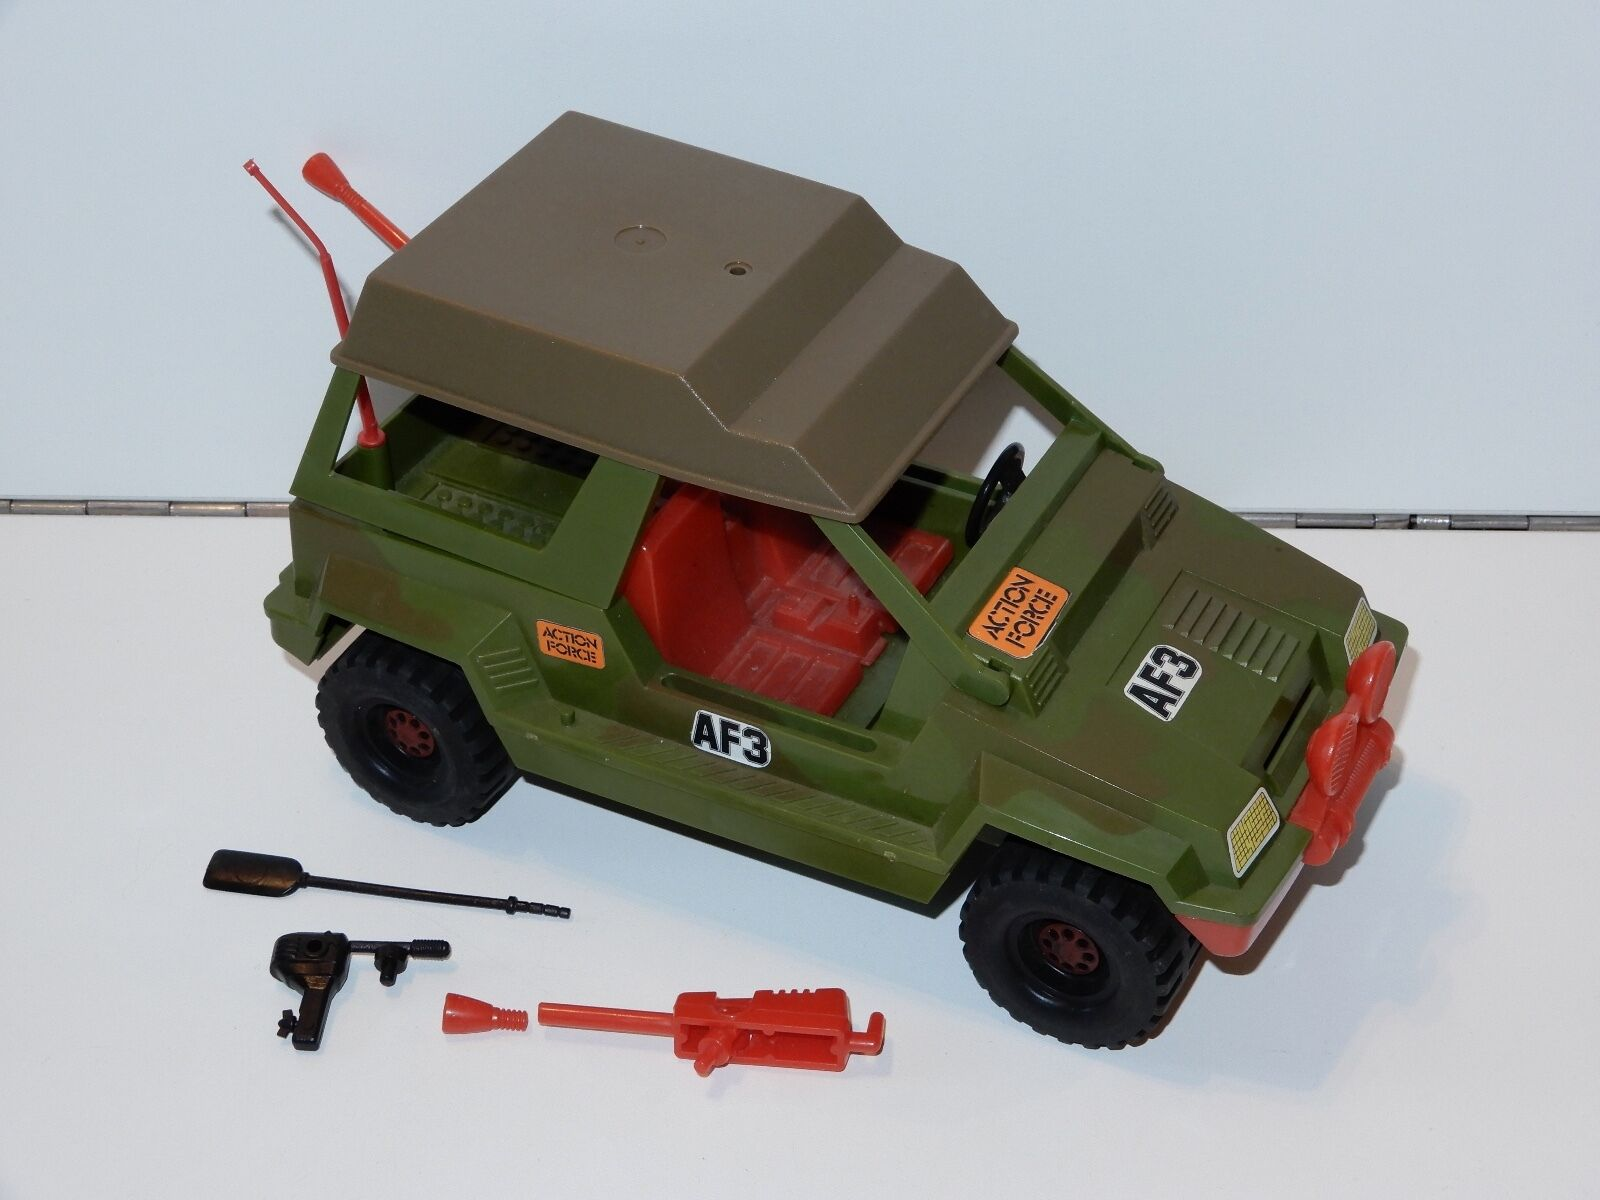 1982 GI JOE   ACTION FORCE AF3 PATROL VEHICLE 100% COMPLETE PALITOY